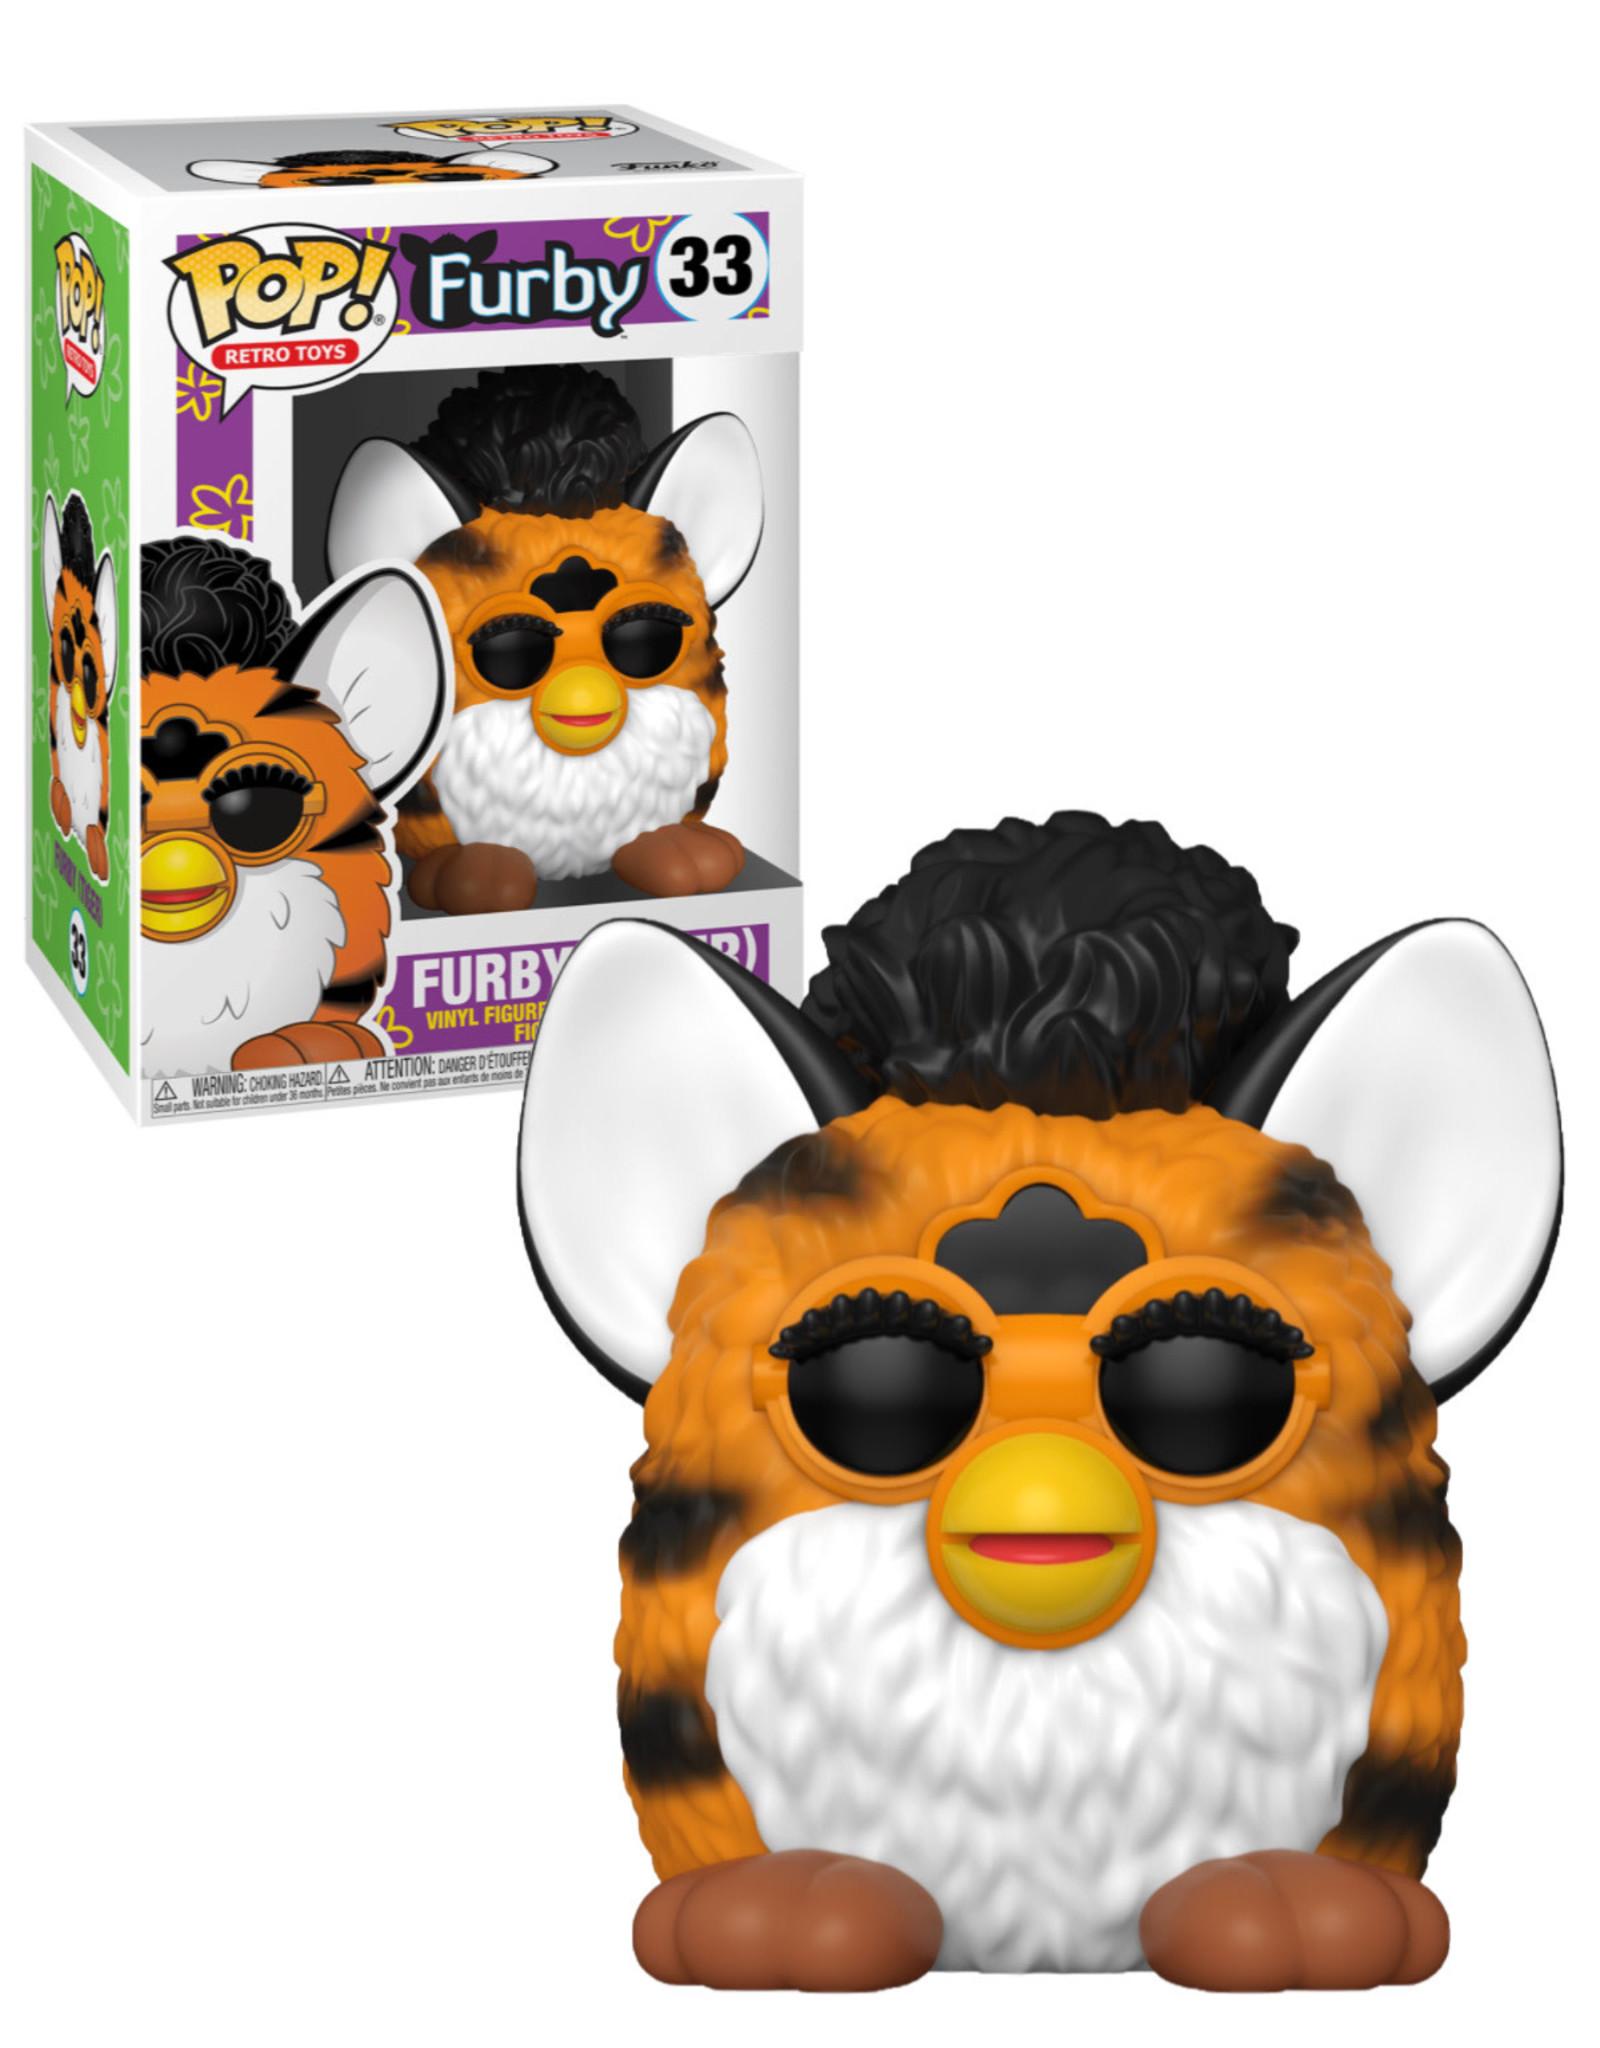 Furby 33 ( Funko Pop ) Furby tiger